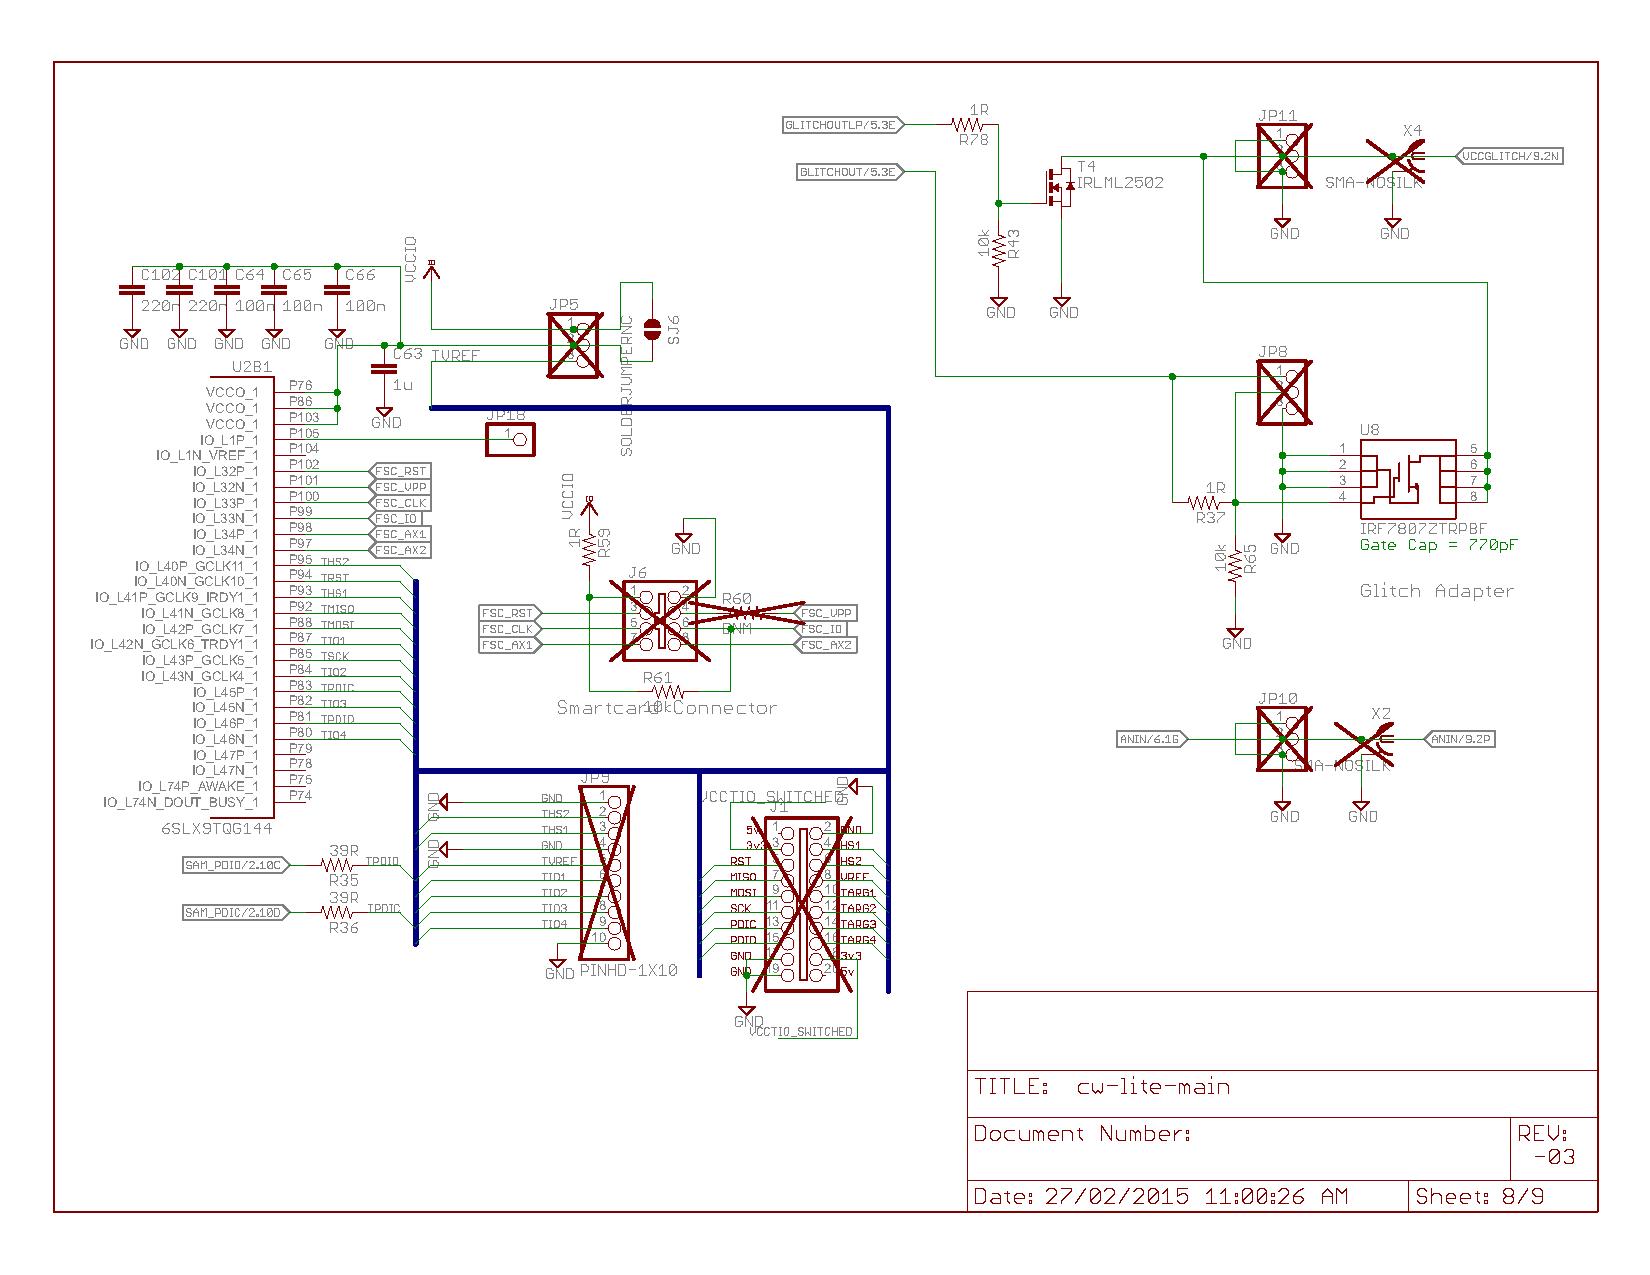 Cw1173 Chipwhisperer Lite Wiki Mosfet Power Amplifier Schematics Cw Main Page 8